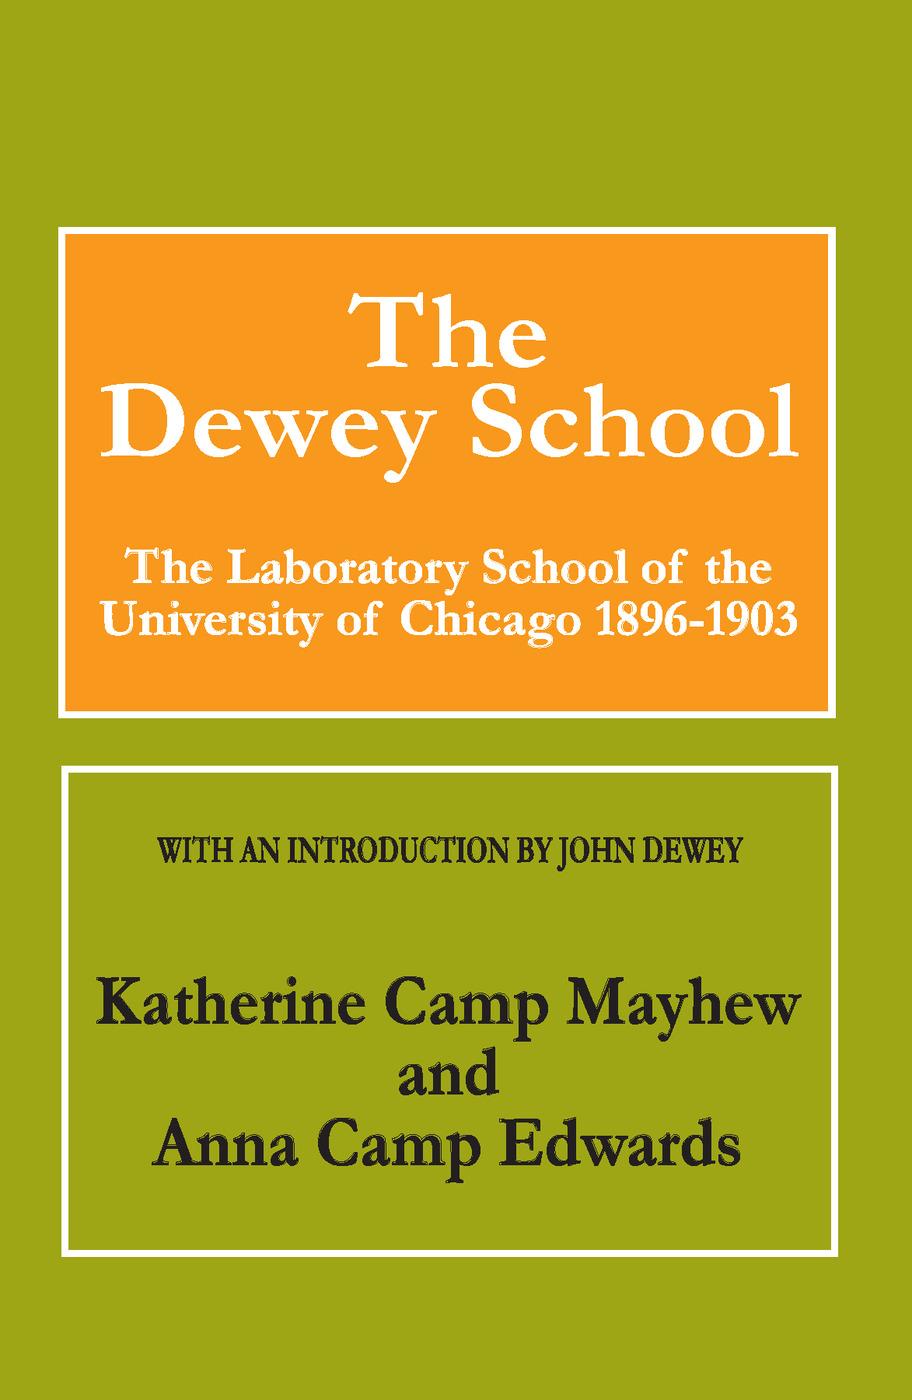 The Dewey School